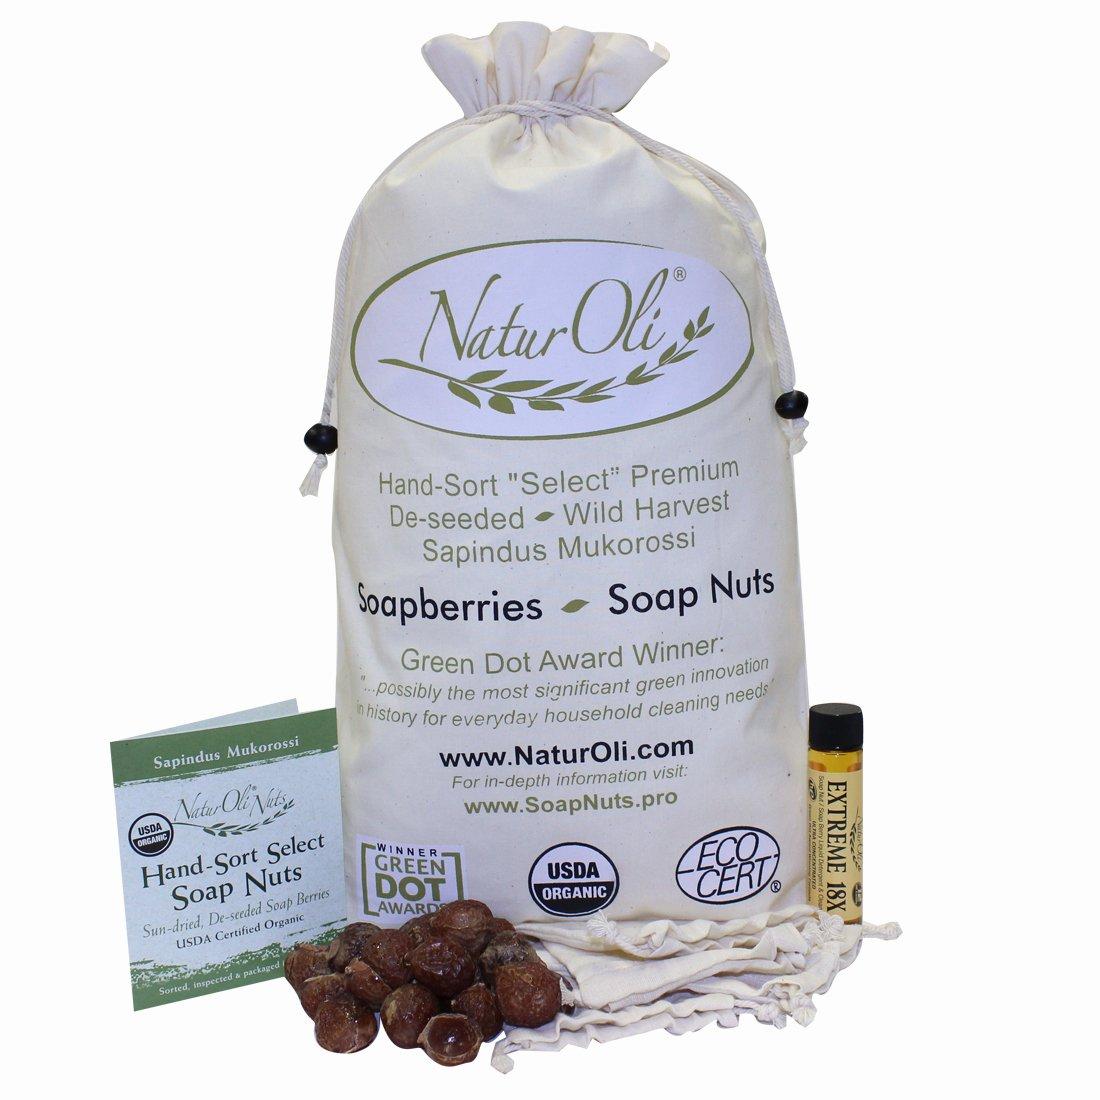 NaturOli Soap Nuts/Soap Berries. 4-Lbs USDA Organic (960 Loads) + 18X Bonus! (12 Loads) Select Seedless, 4 Wash Bags, Tote Bag, 8-pg info. Organic Laundry Soap/Natural Cleaner. Processed in USA!